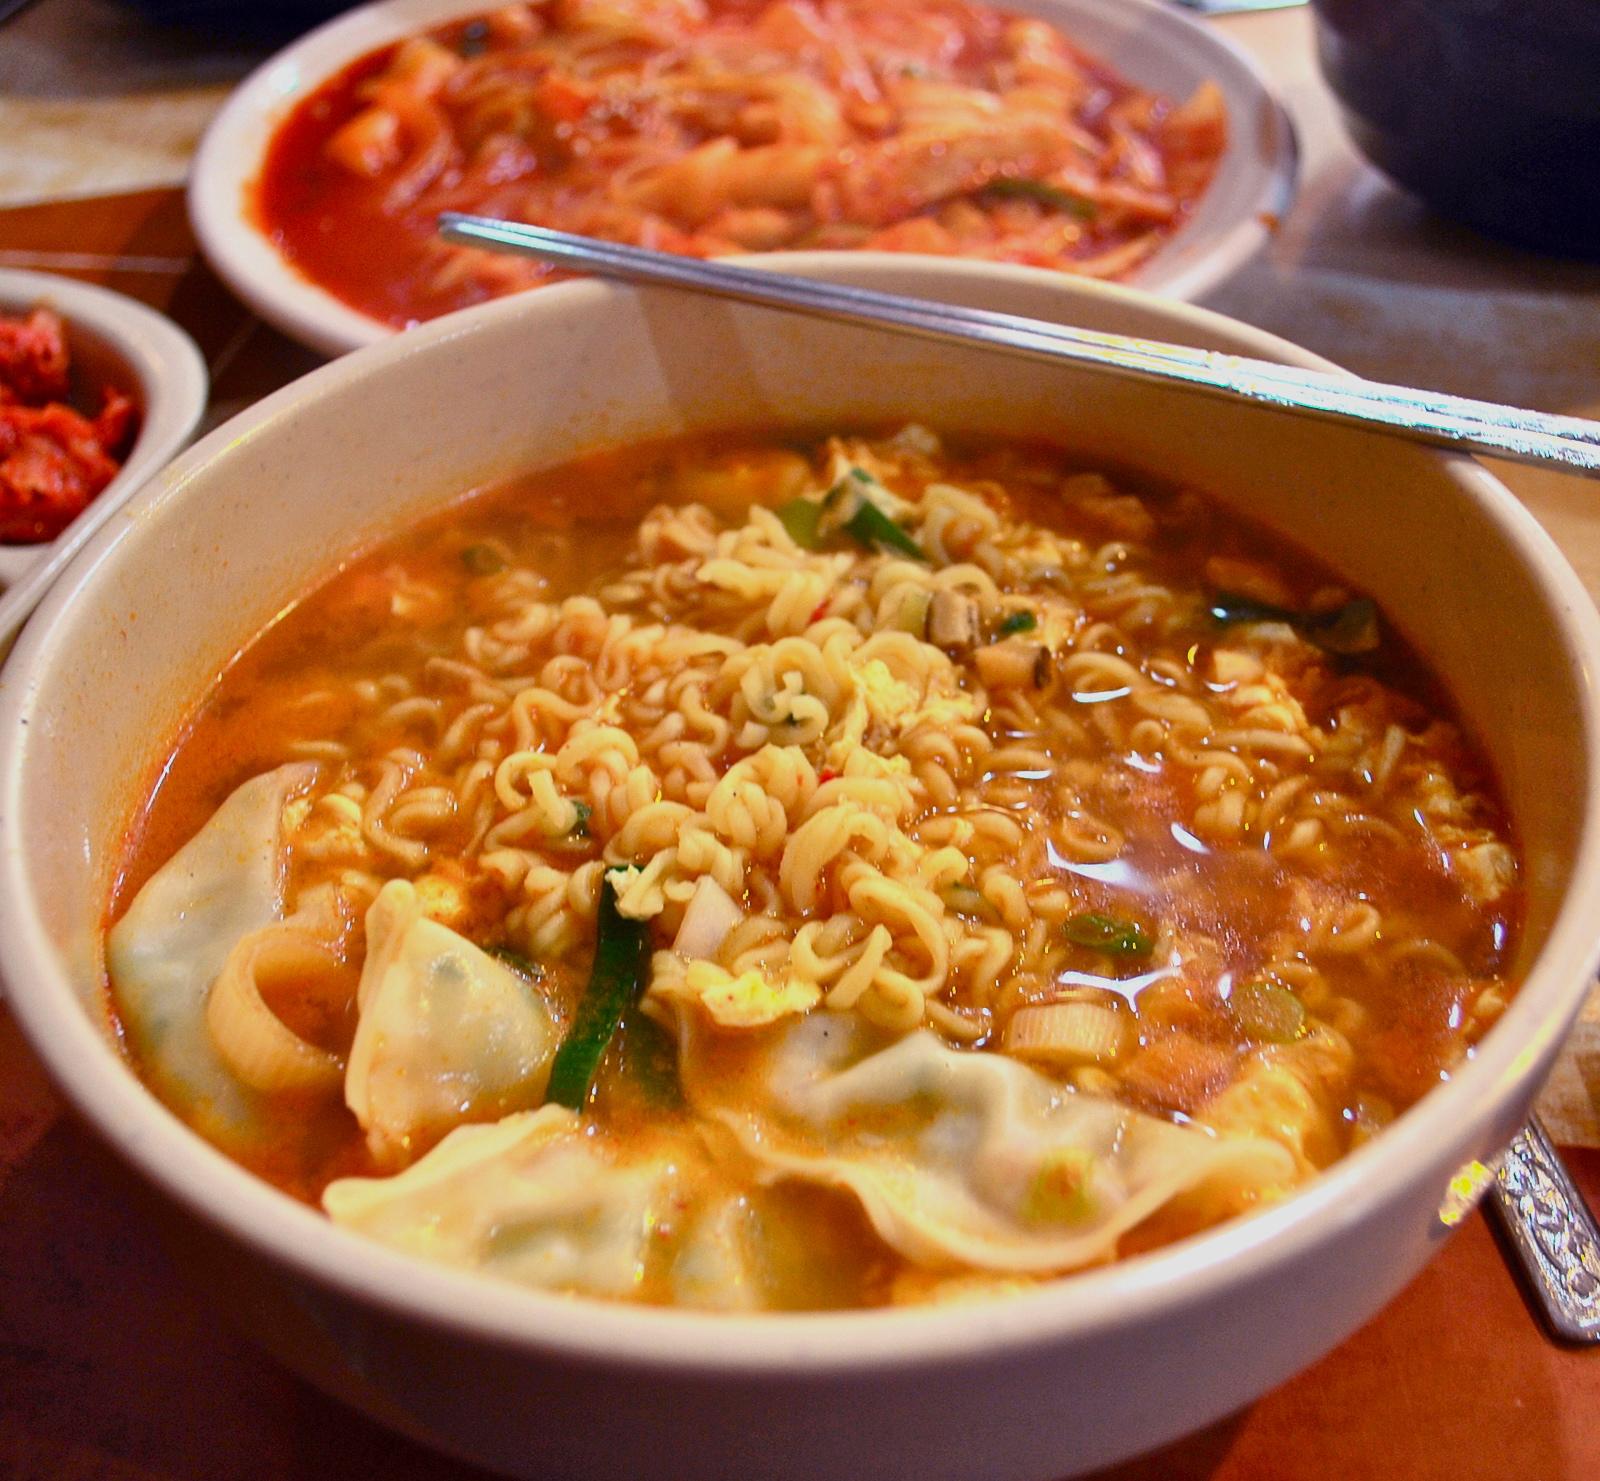 Korean ramen noodles with dumplings